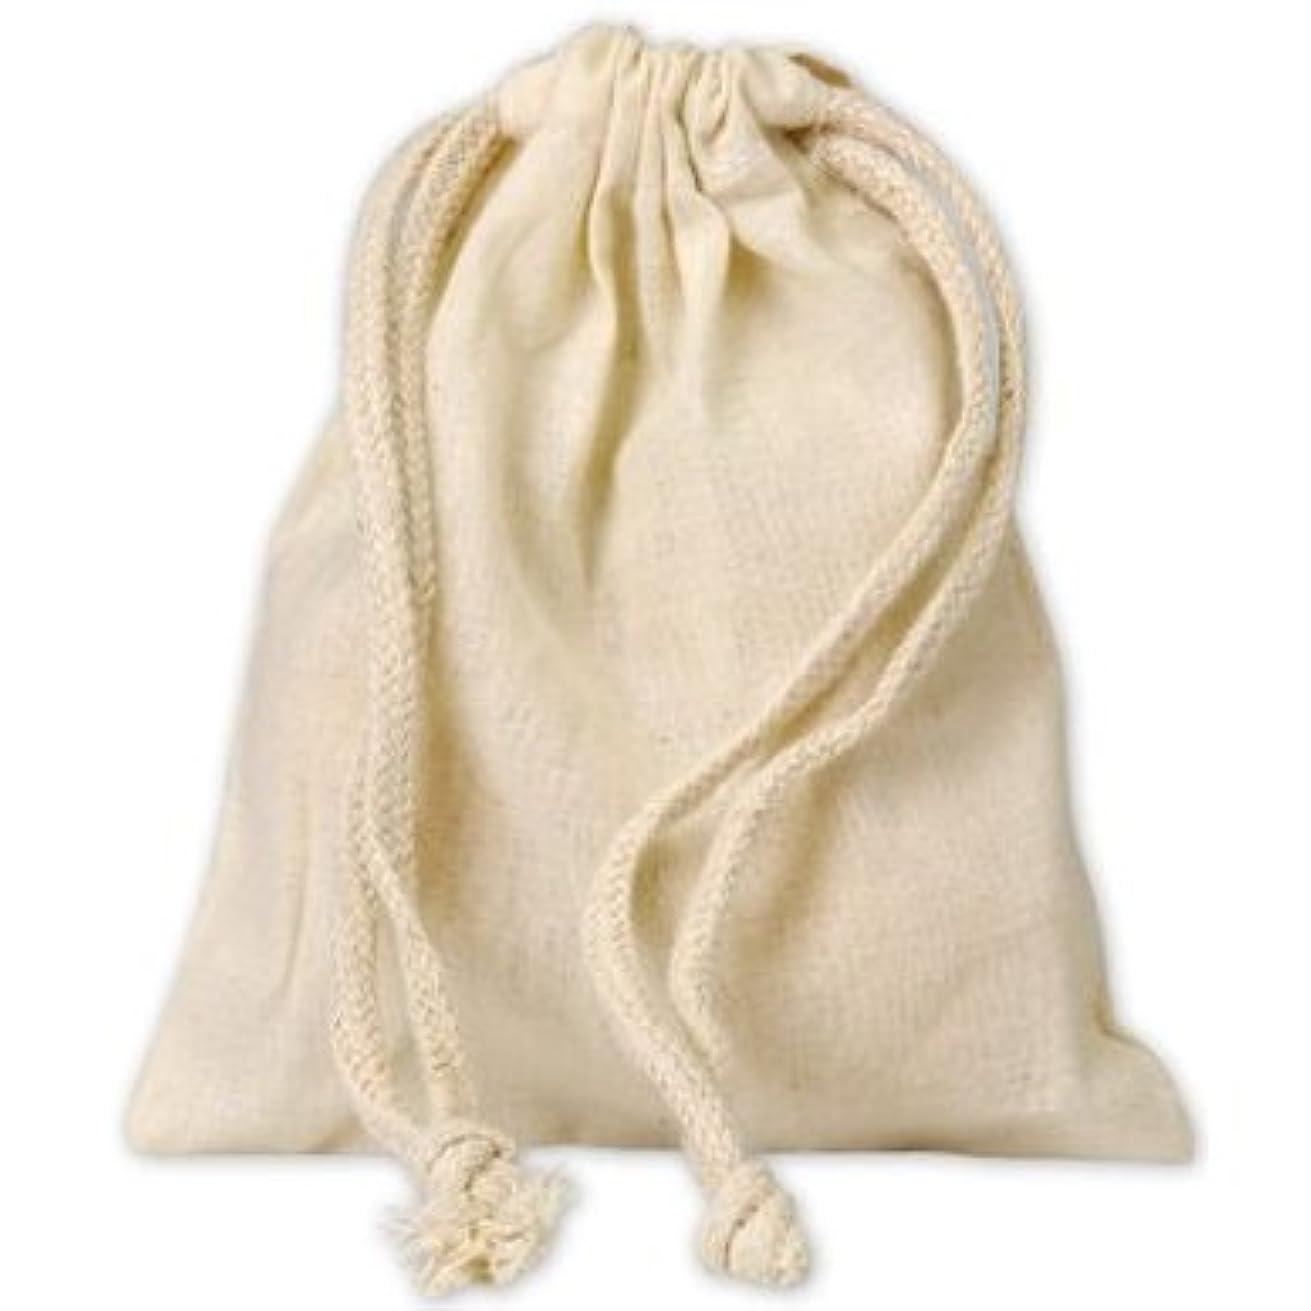 24 4x6 Muslin Bags